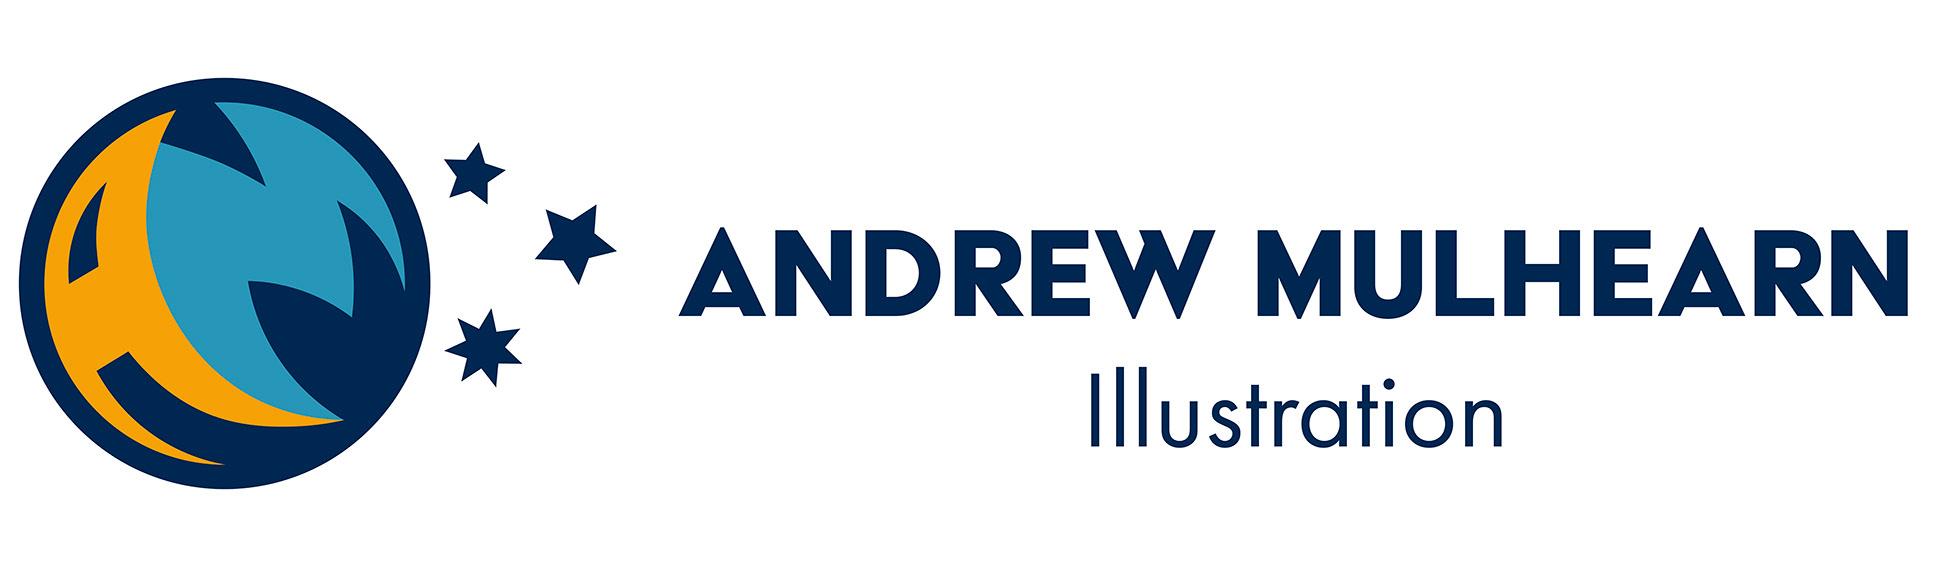 Andy Mulhearn